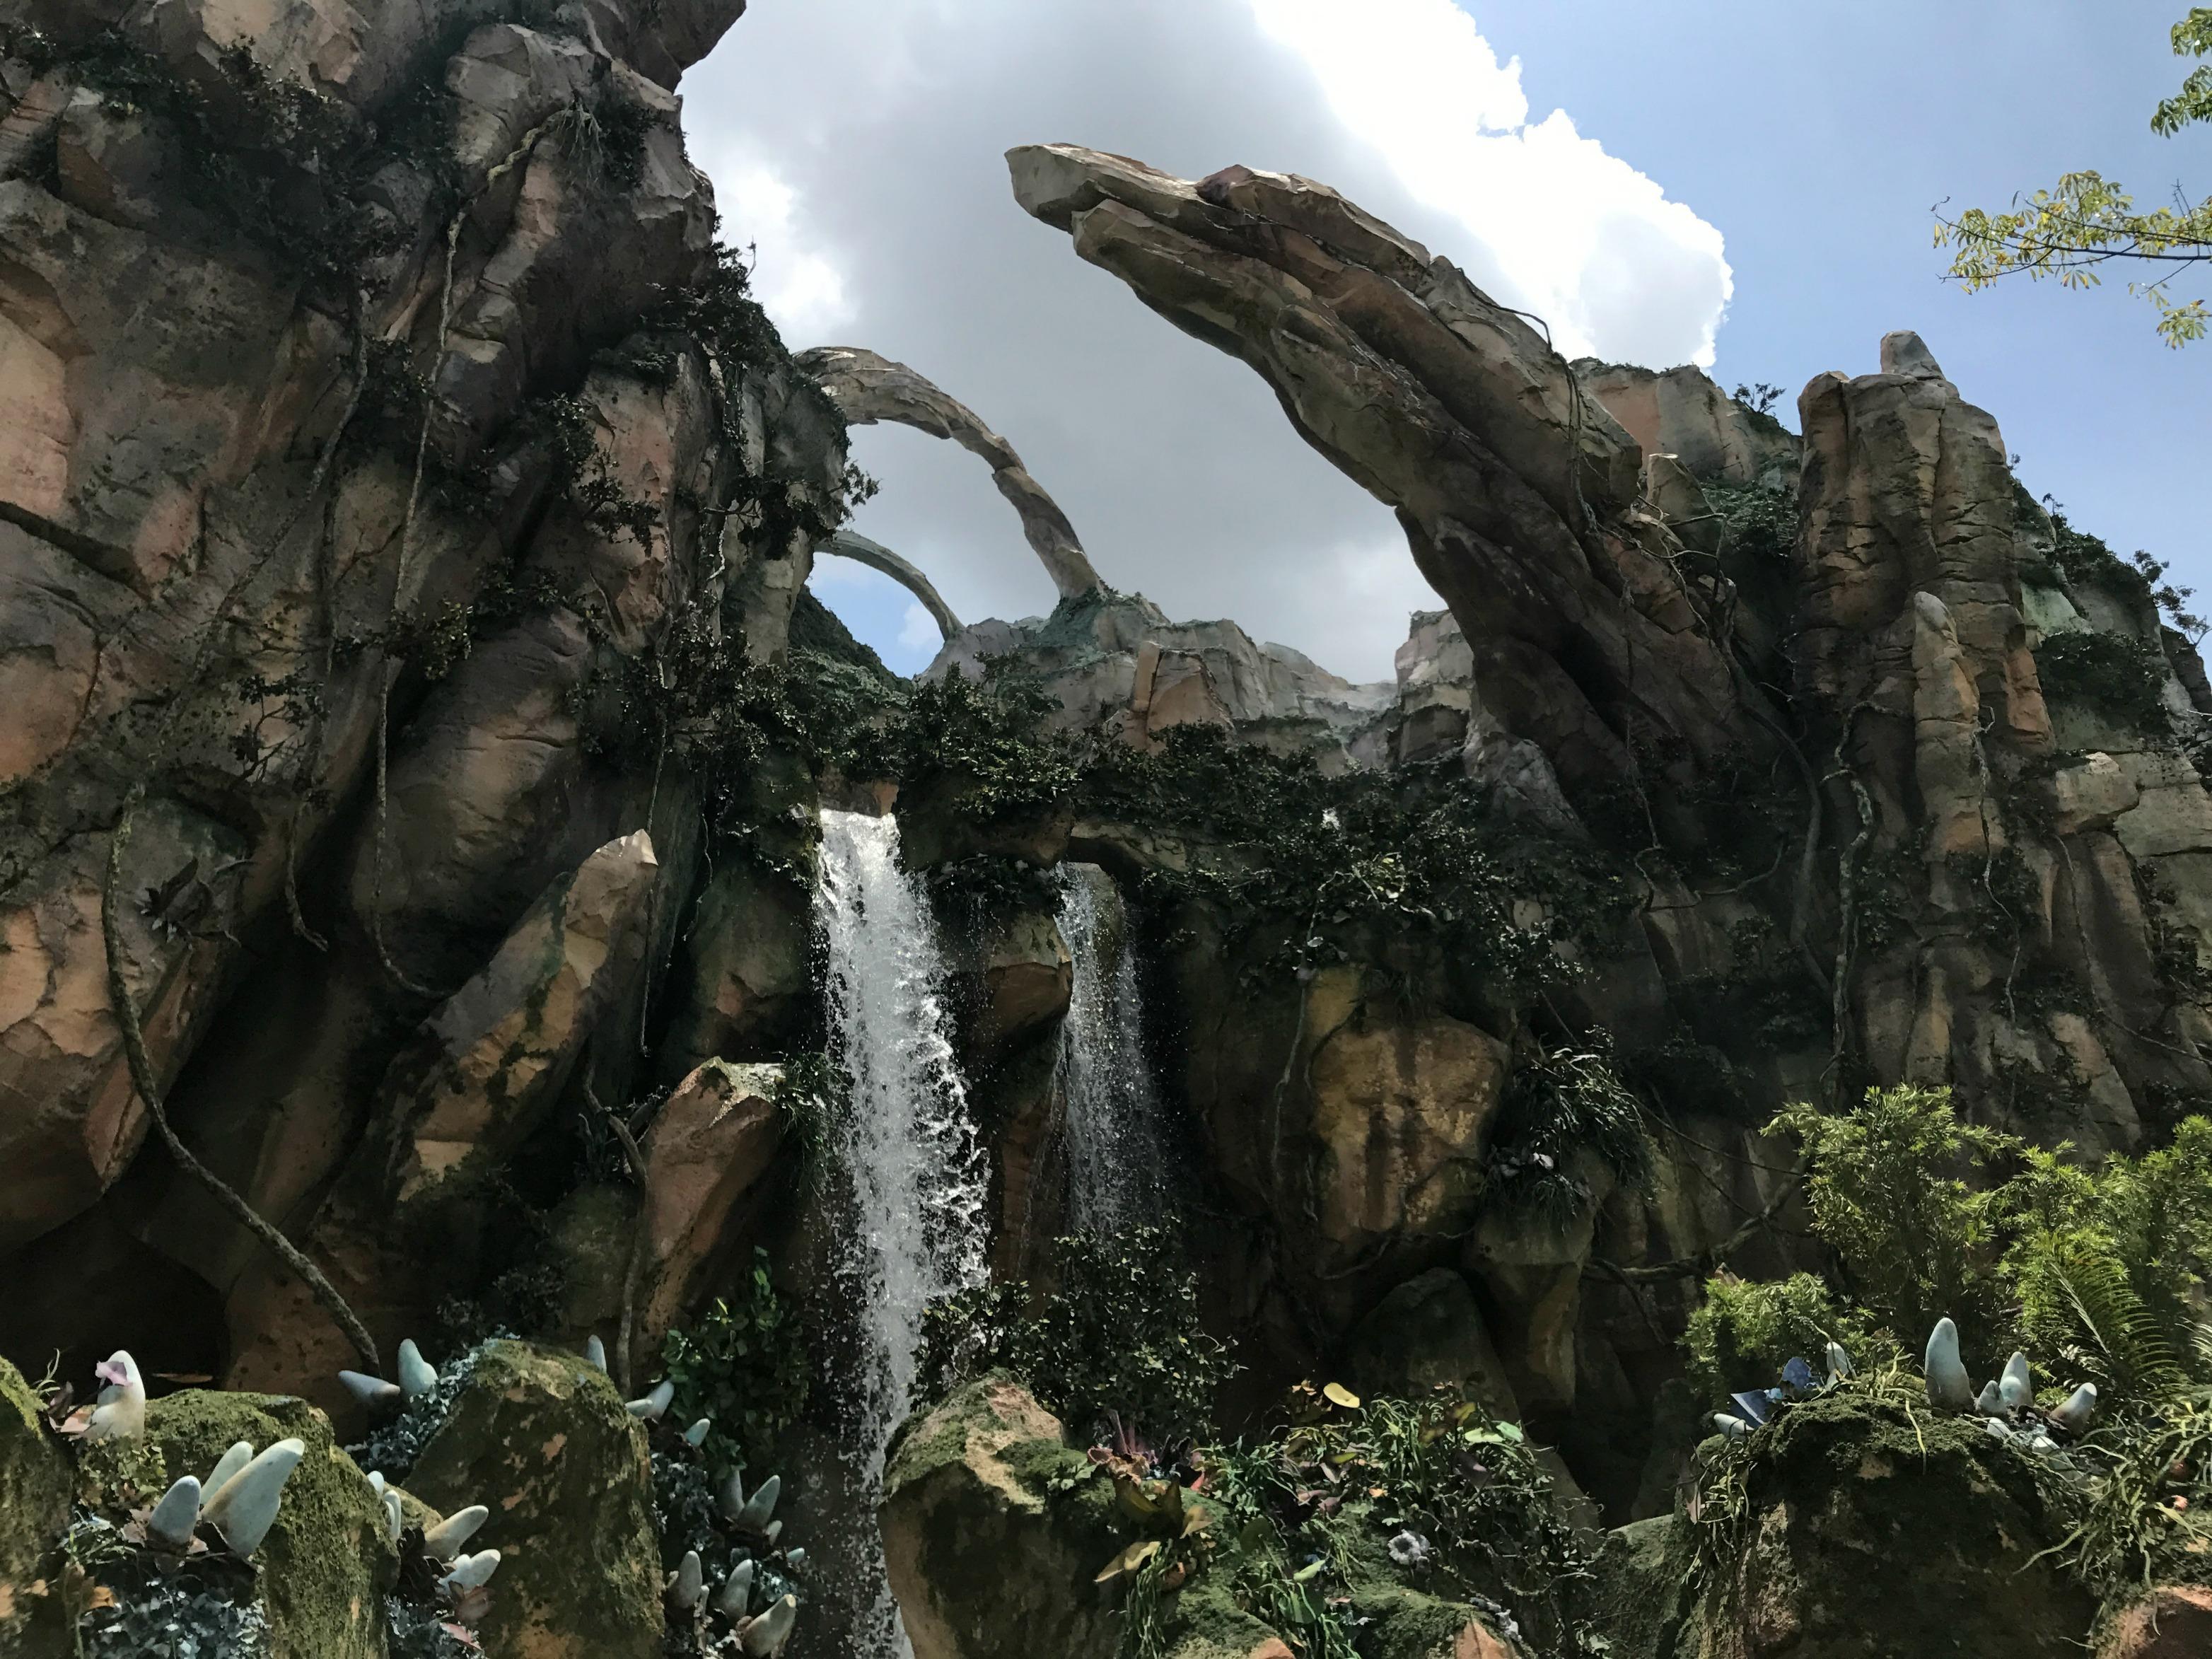 Visiting Disney's Pandora Landscape